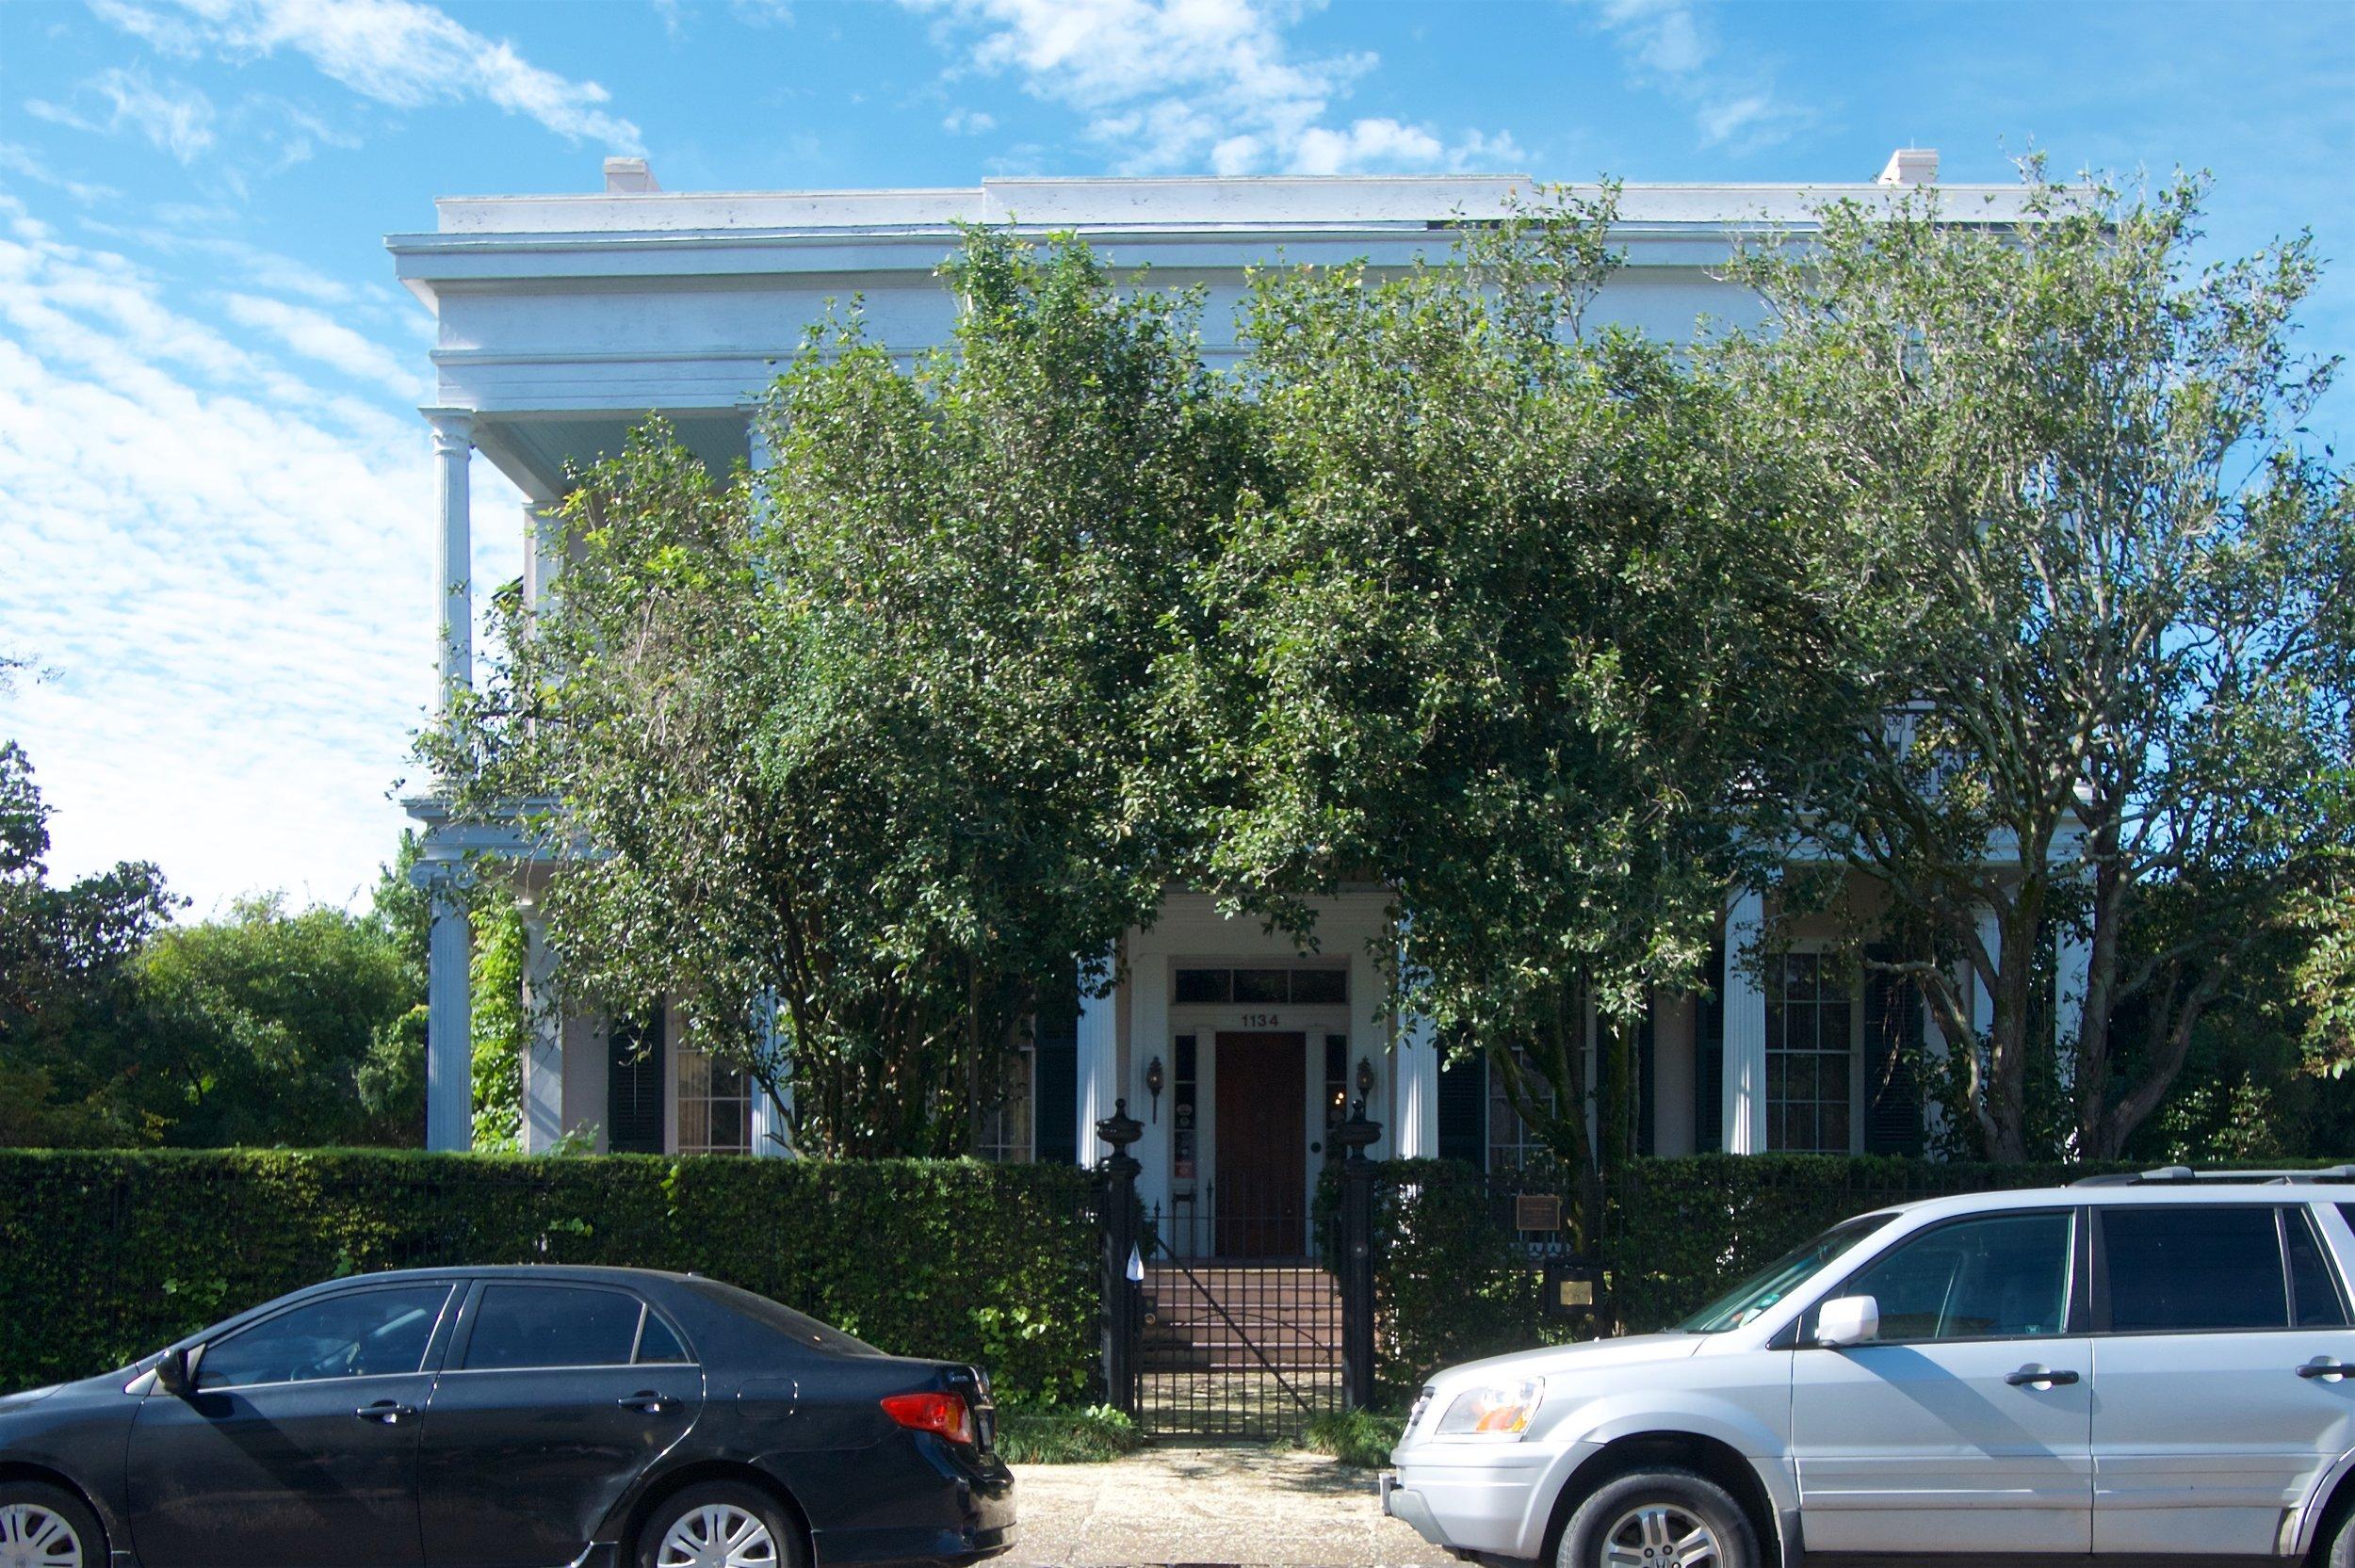 House where Jefferson Davis died